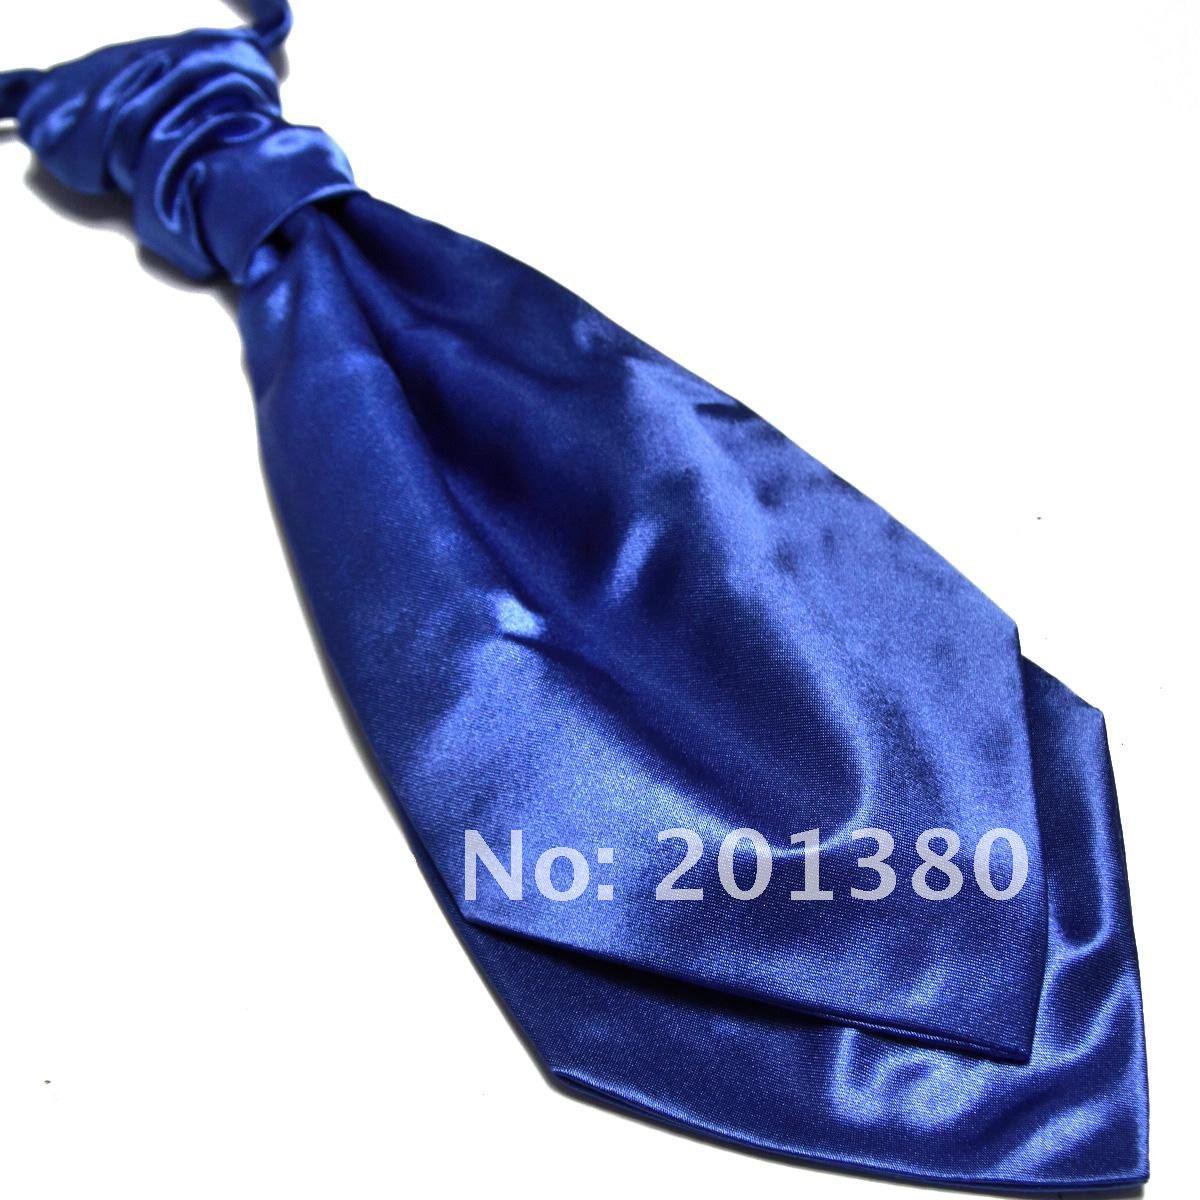 Corbatas 2019 para hombres corbata de color sólido corbata de boda Ascot copia seda color sólido moda corbata de poliéster